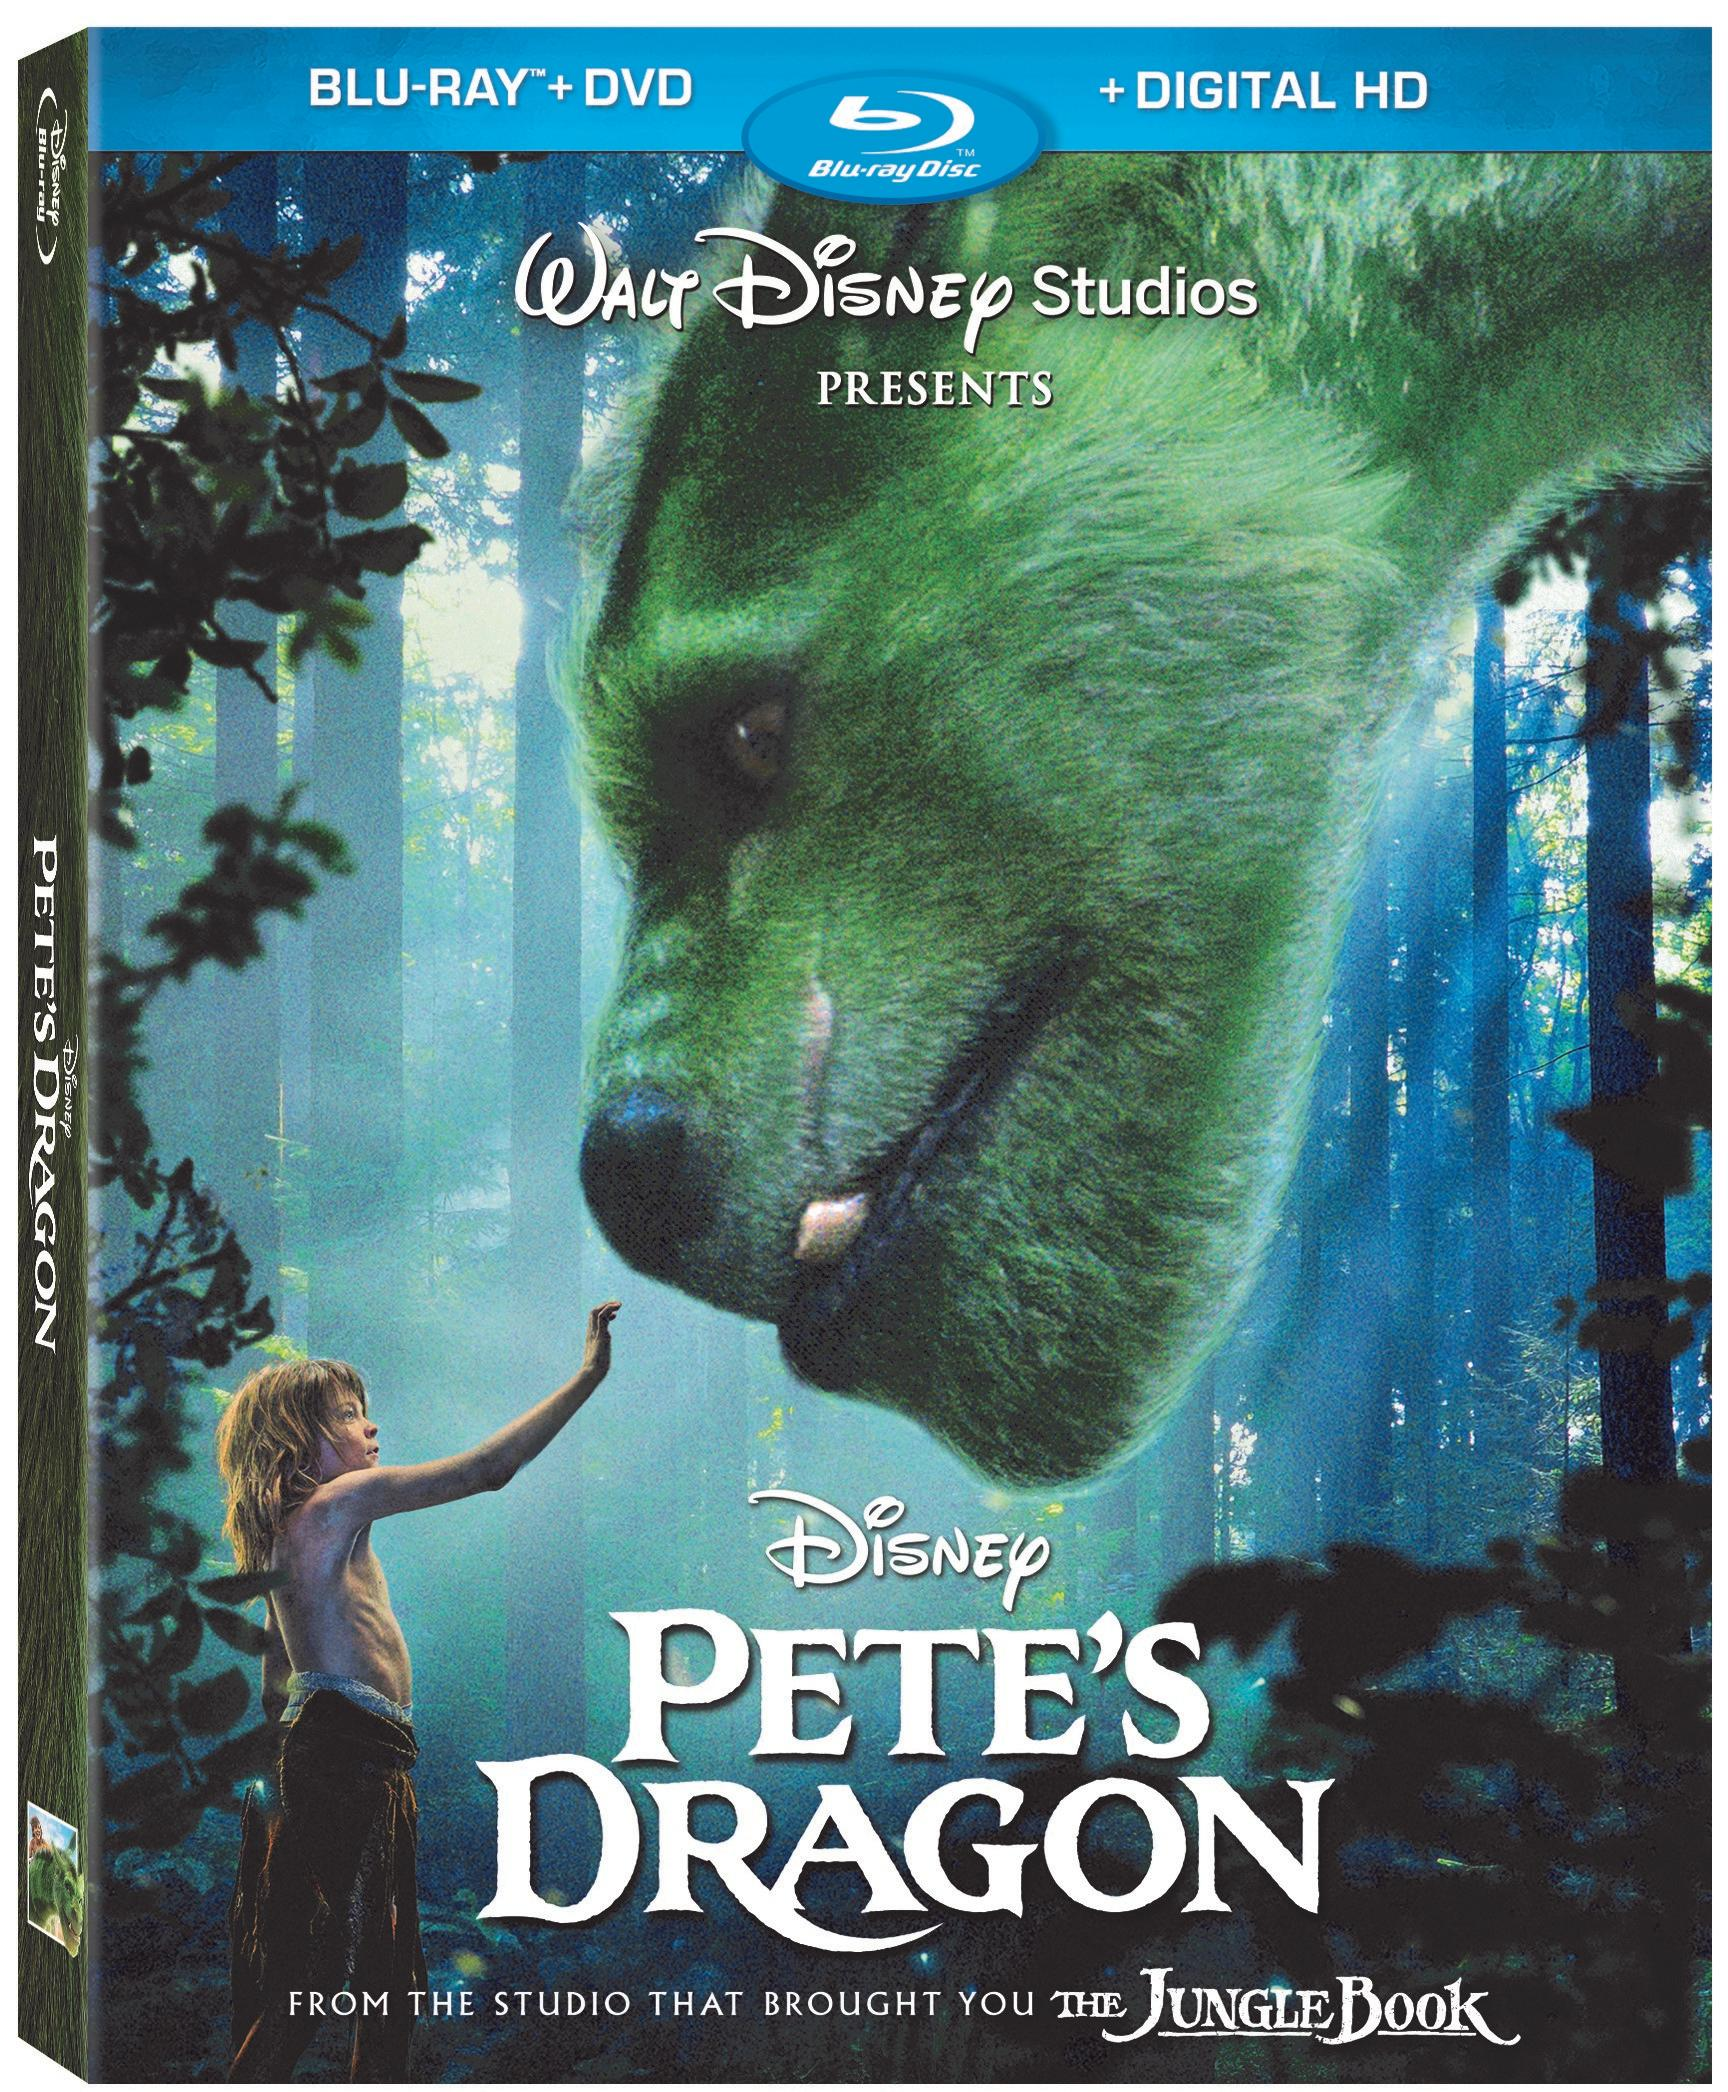 Pete's Dragon Announces Home Video Release Date